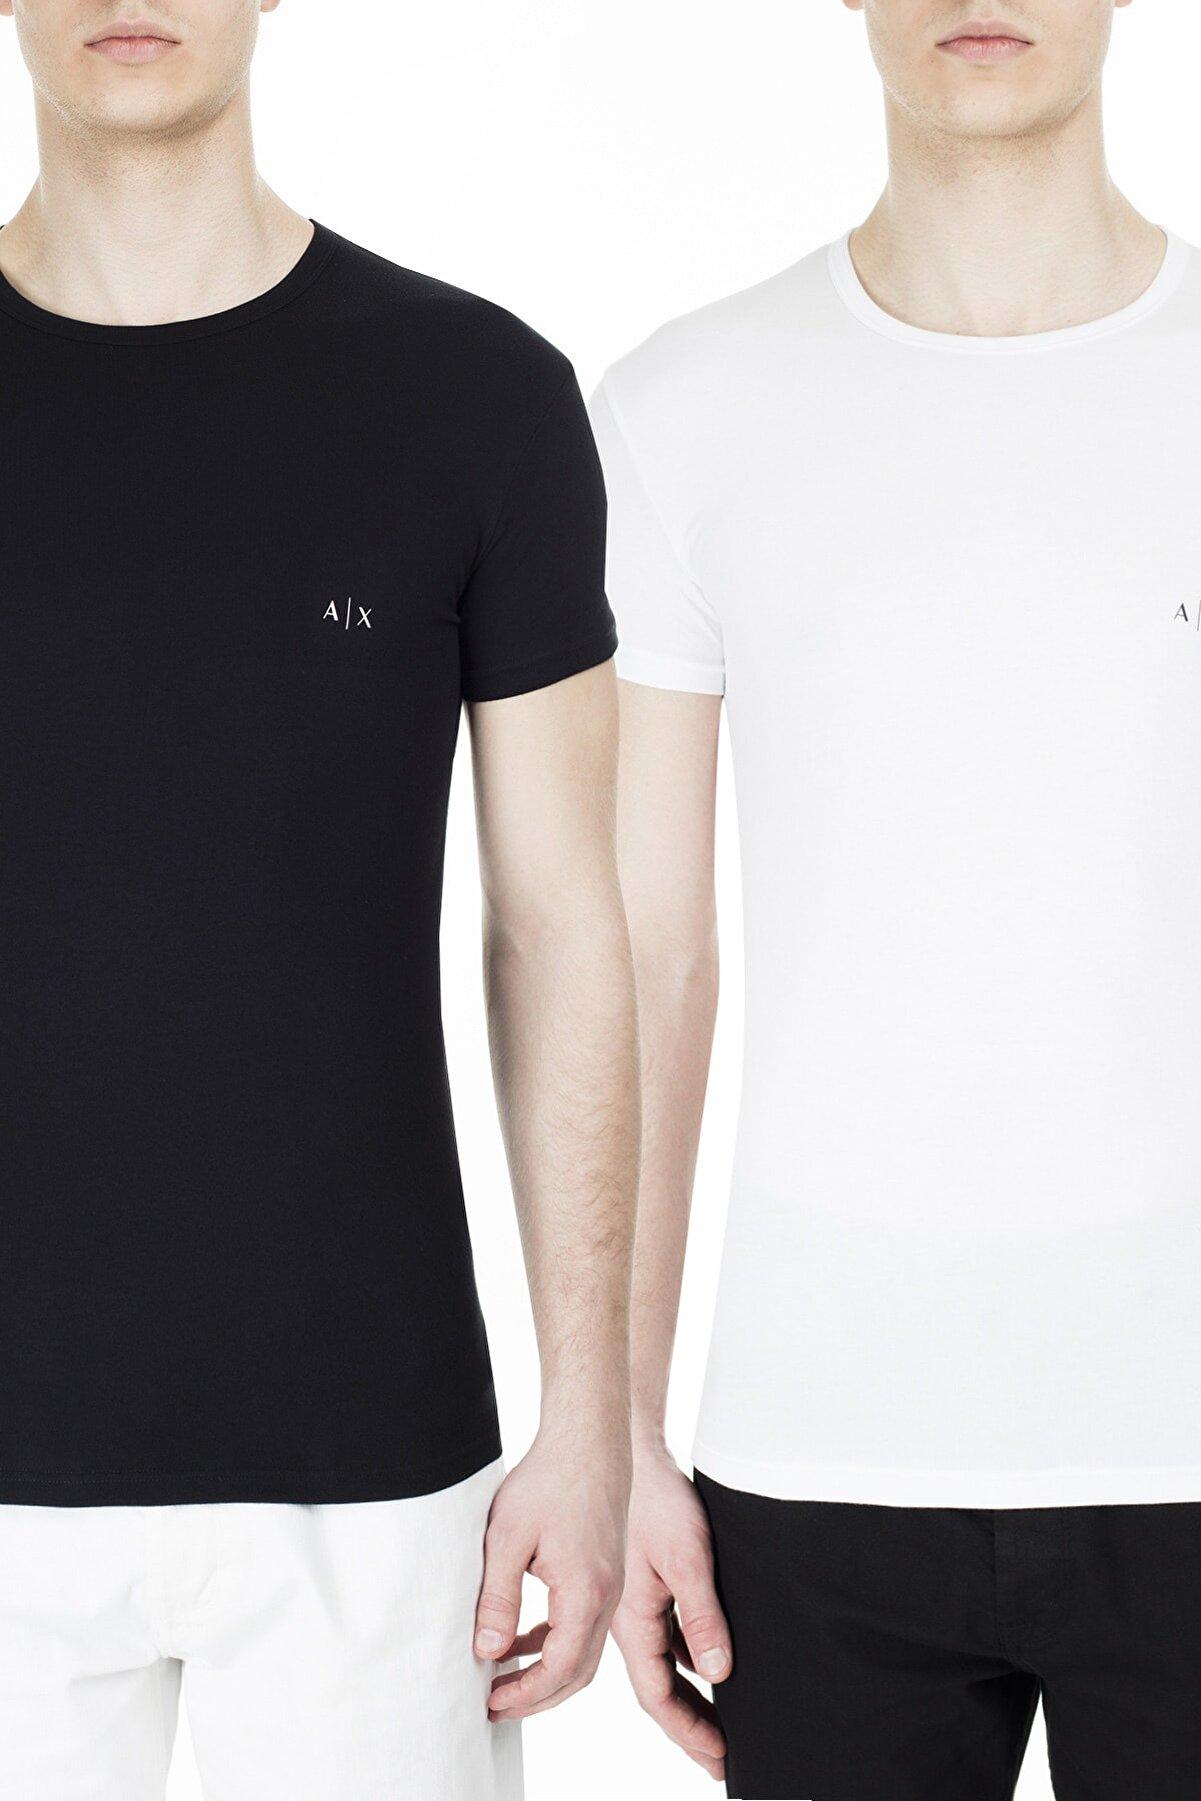 Armani Exchange Erkek Siyah Beyaz 2'li T Shirt 956005 Cc282 42520